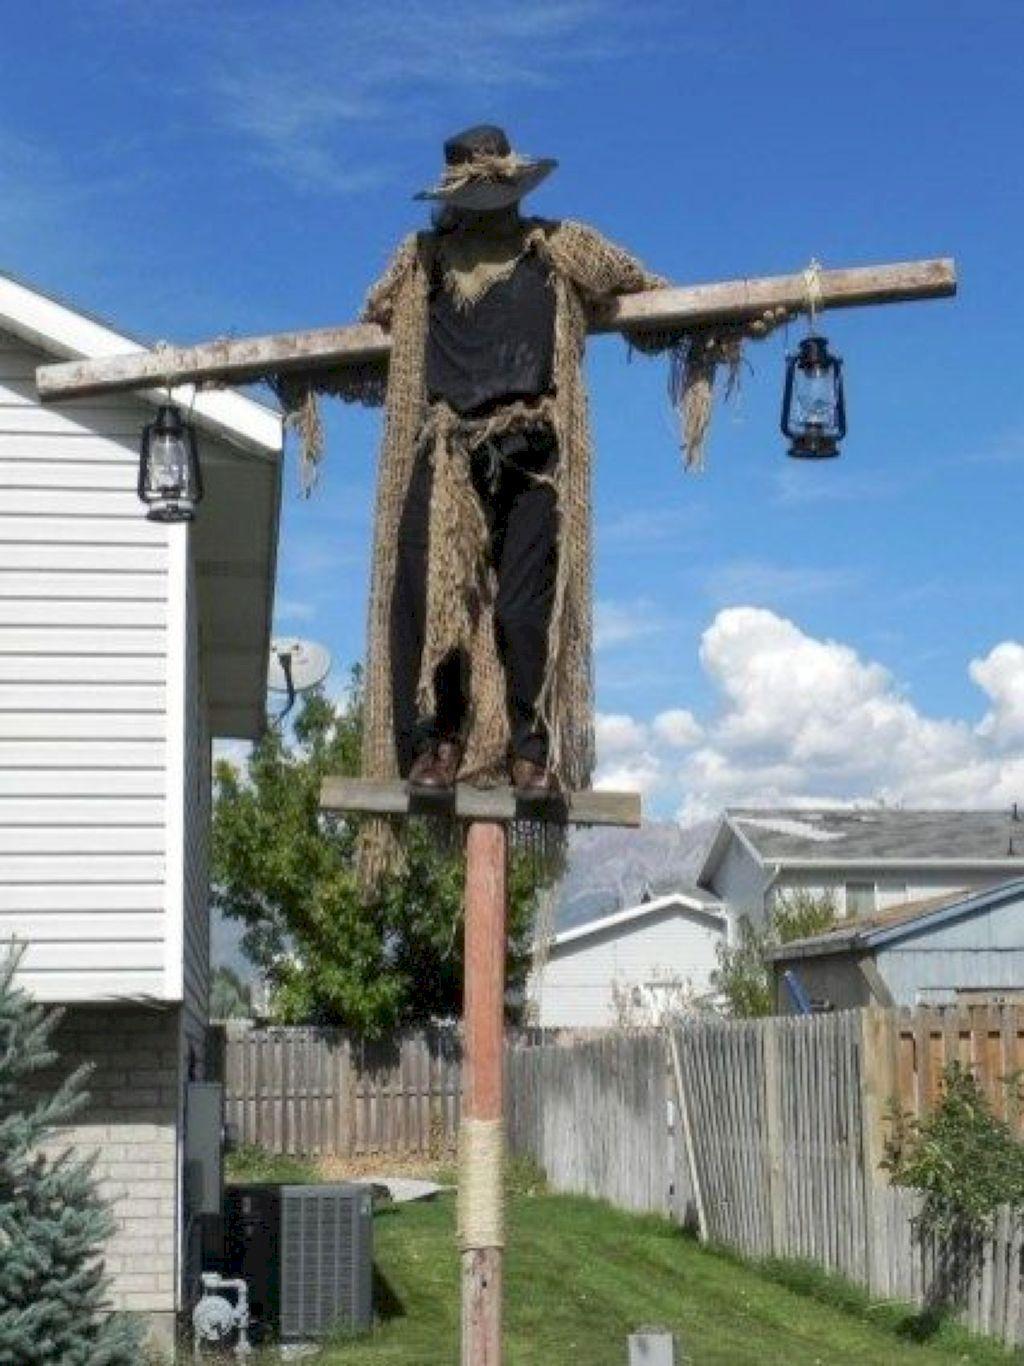 The Best Halloween Garden Decor Ideas 34